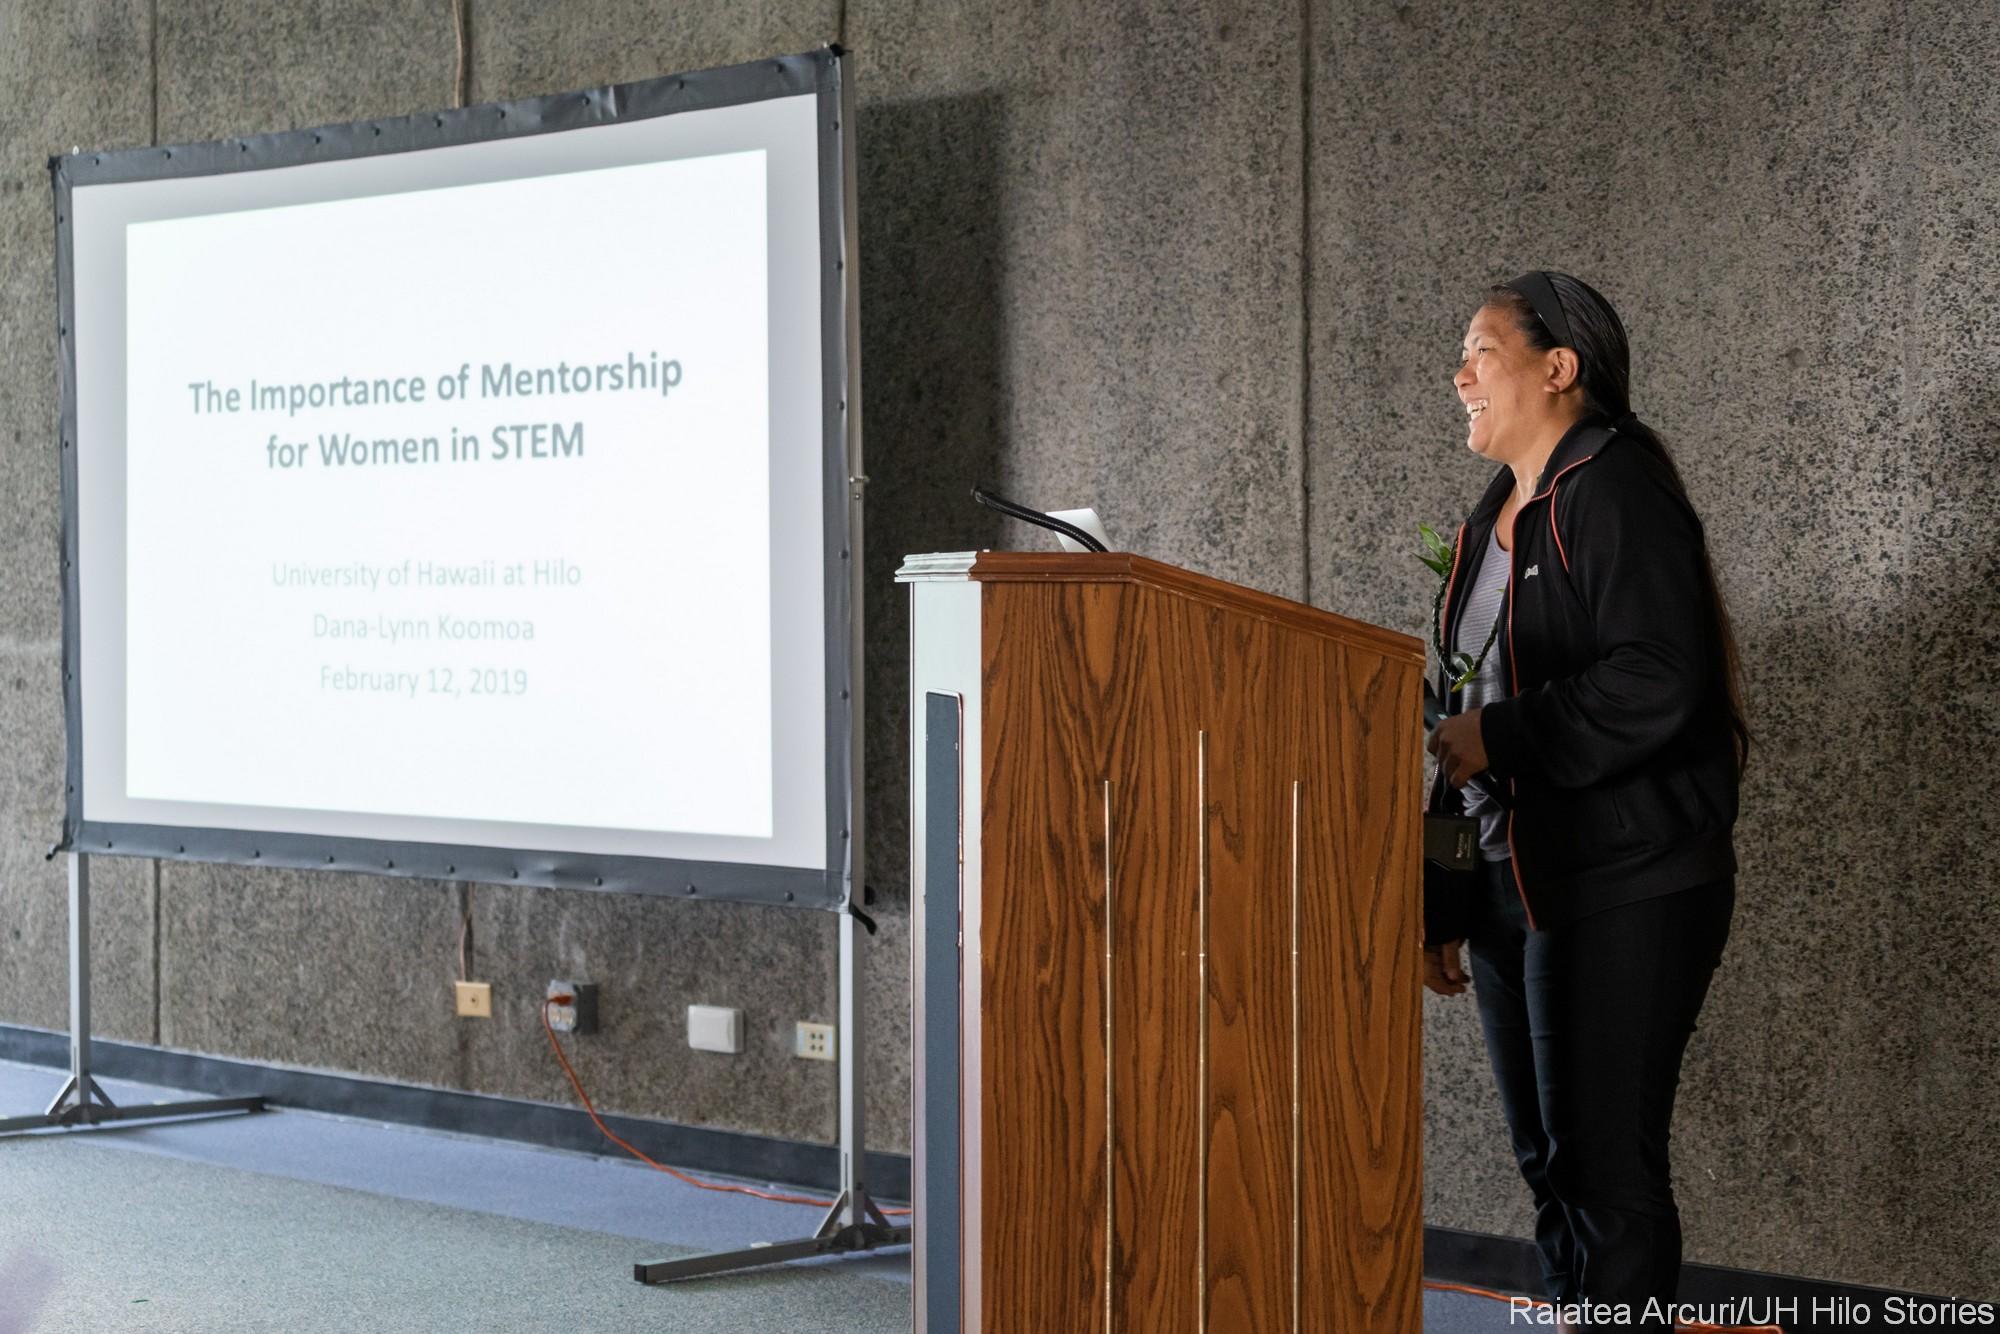 Dana-Lynn Koʻomoa-Lange at podium delivering remarks. On screen topic: The Importance of Mentroship fr Women in STEM